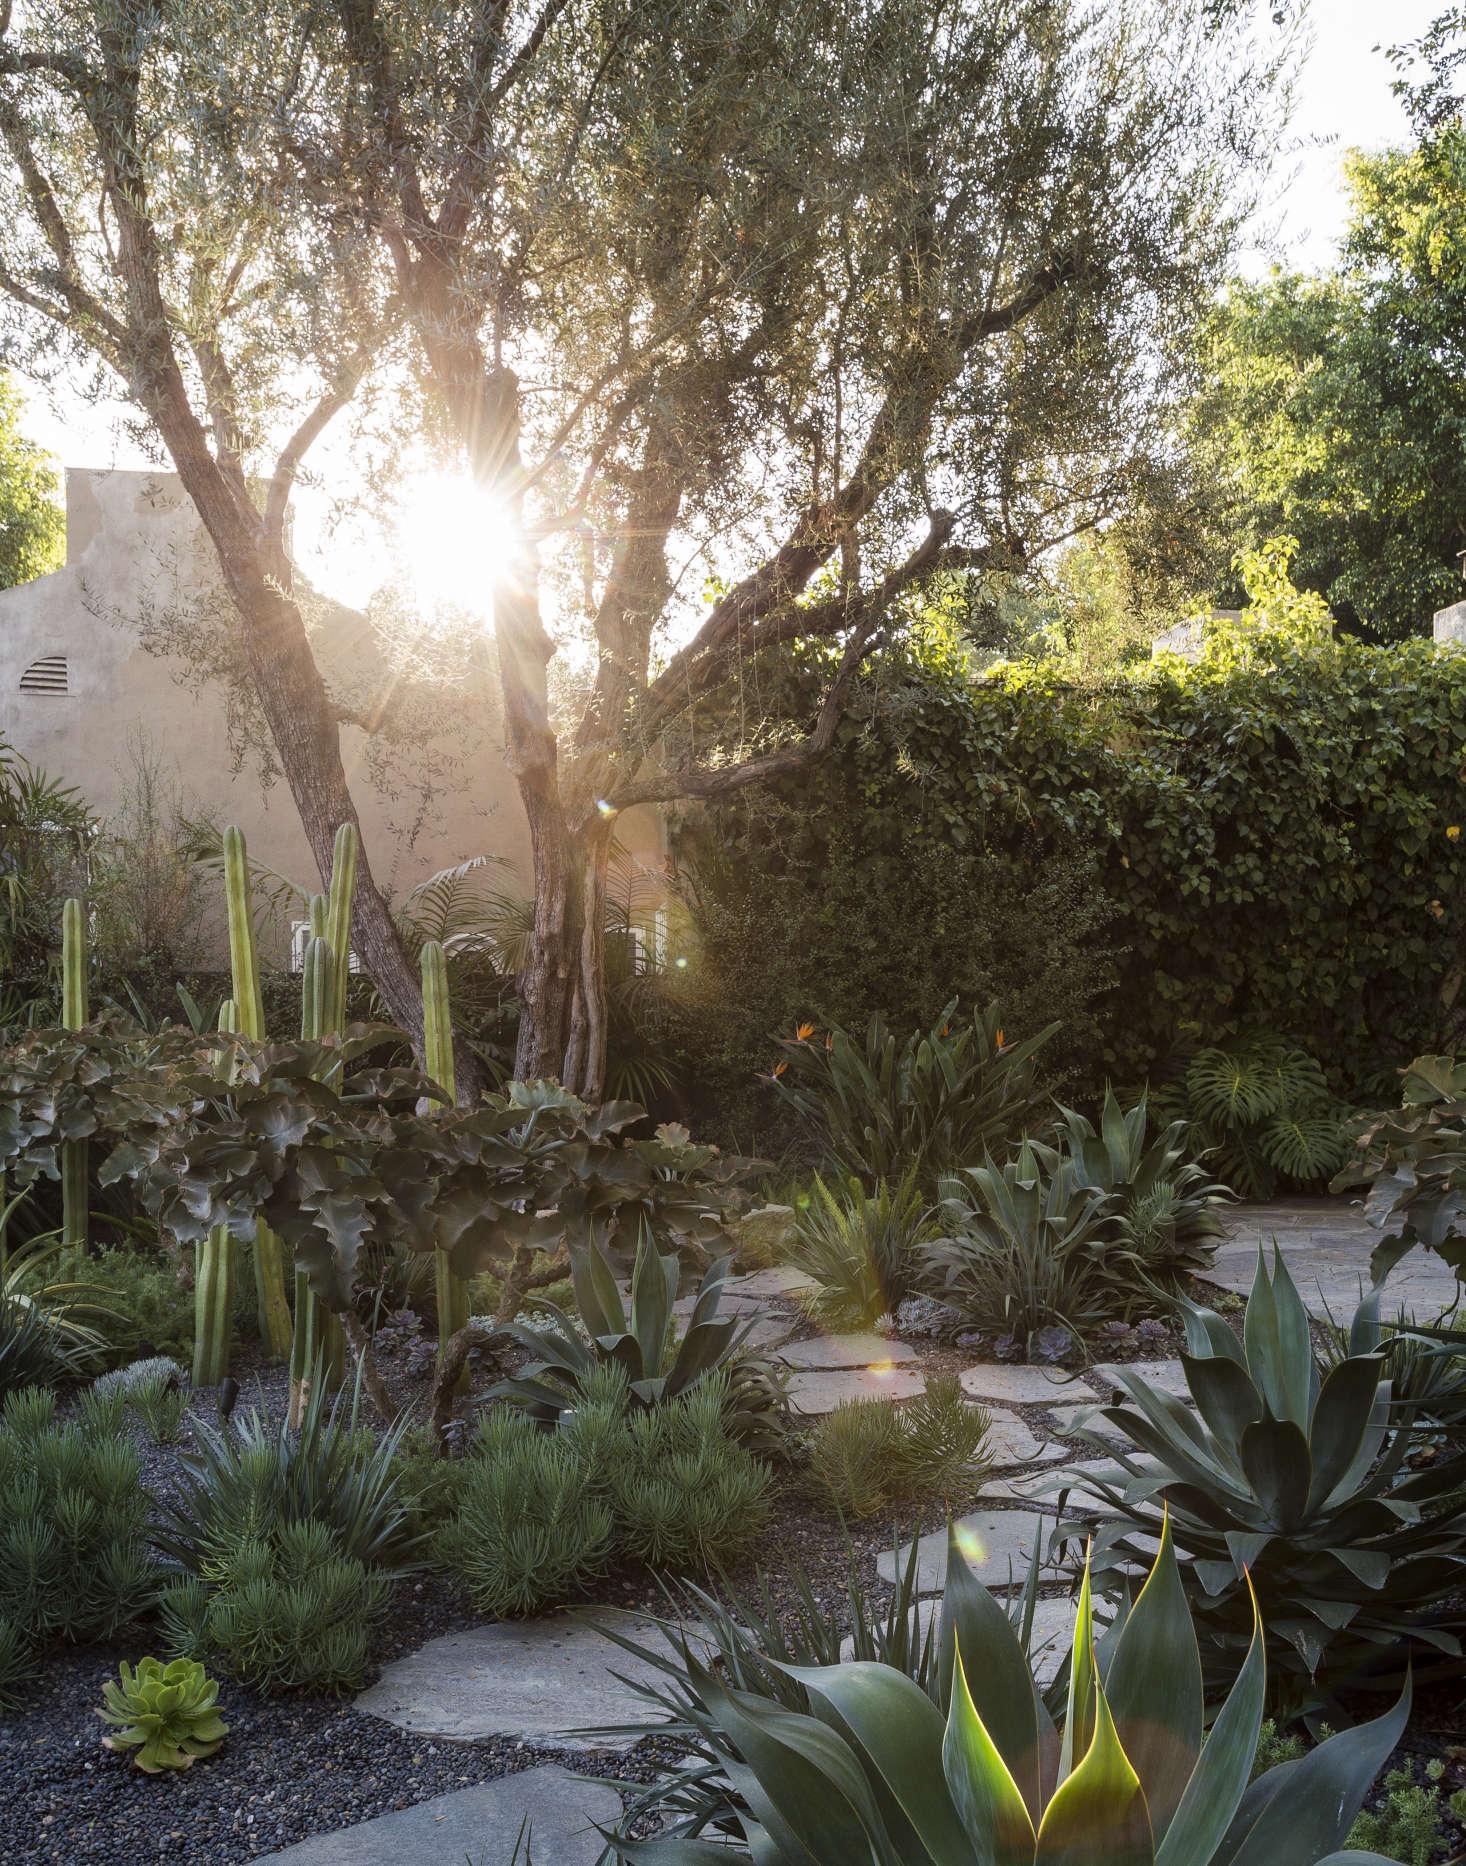 Landscape Design: 10 Tips for a Fire-Safe Garden - Gardenista